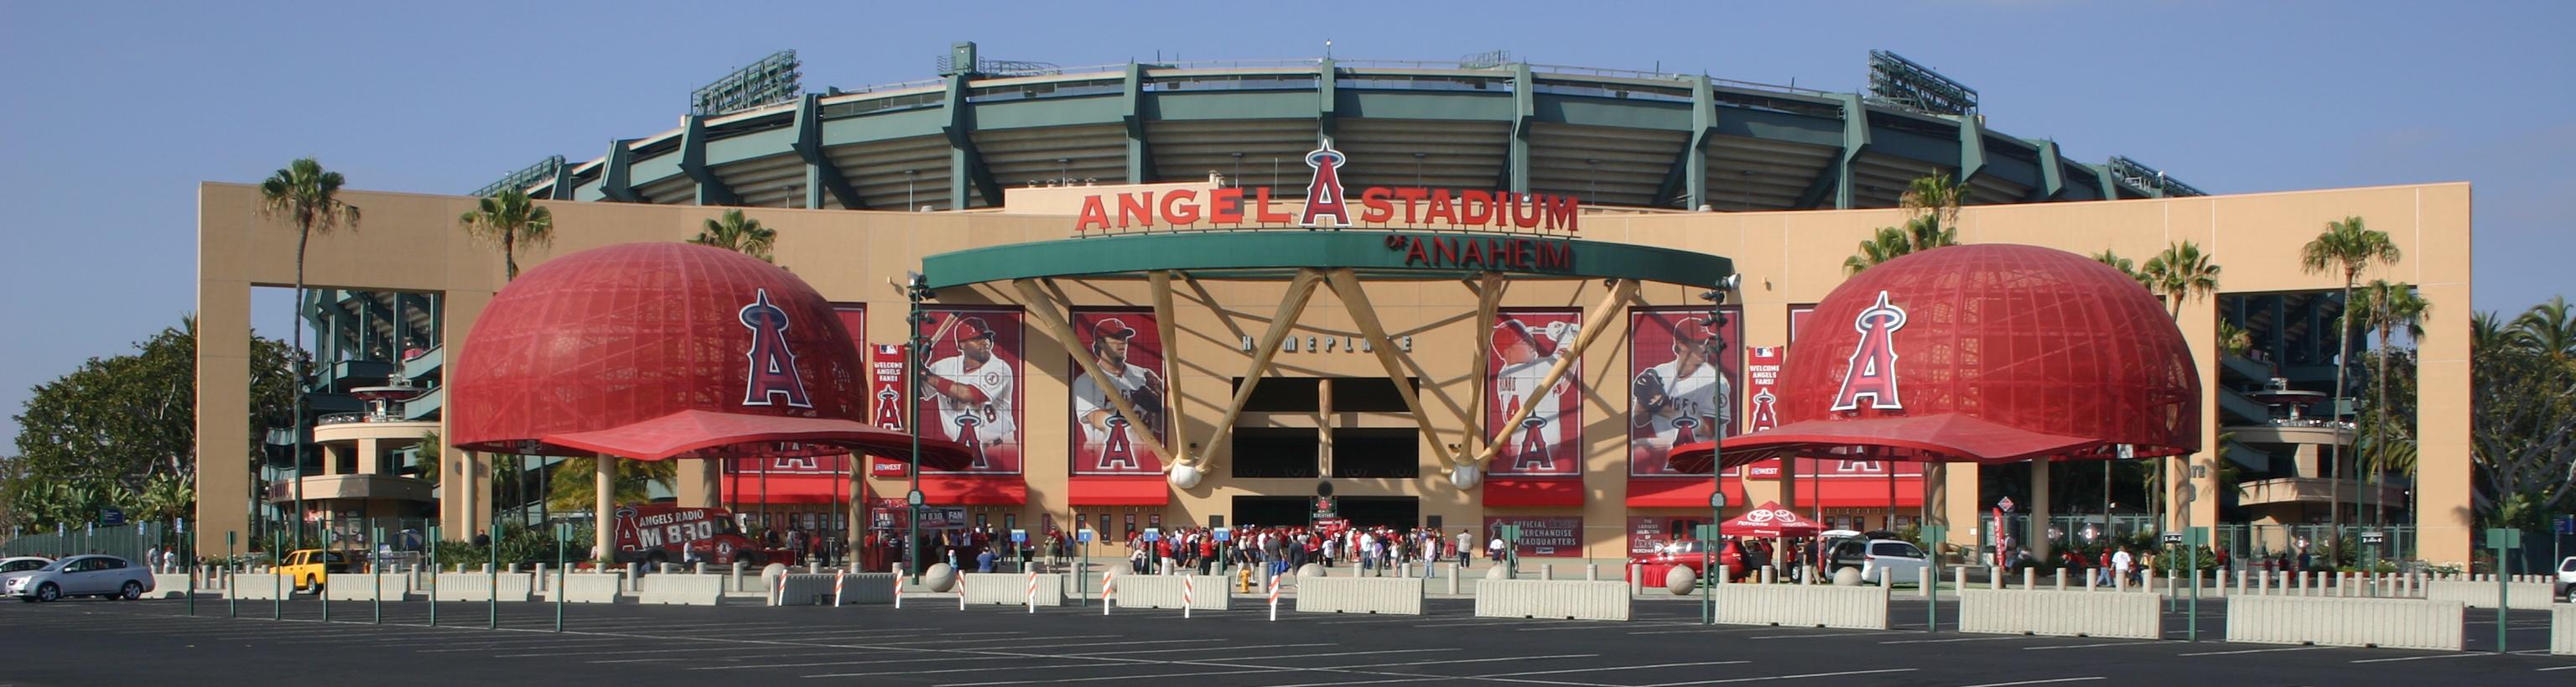 Angel_Stadium_Entrance.jpg